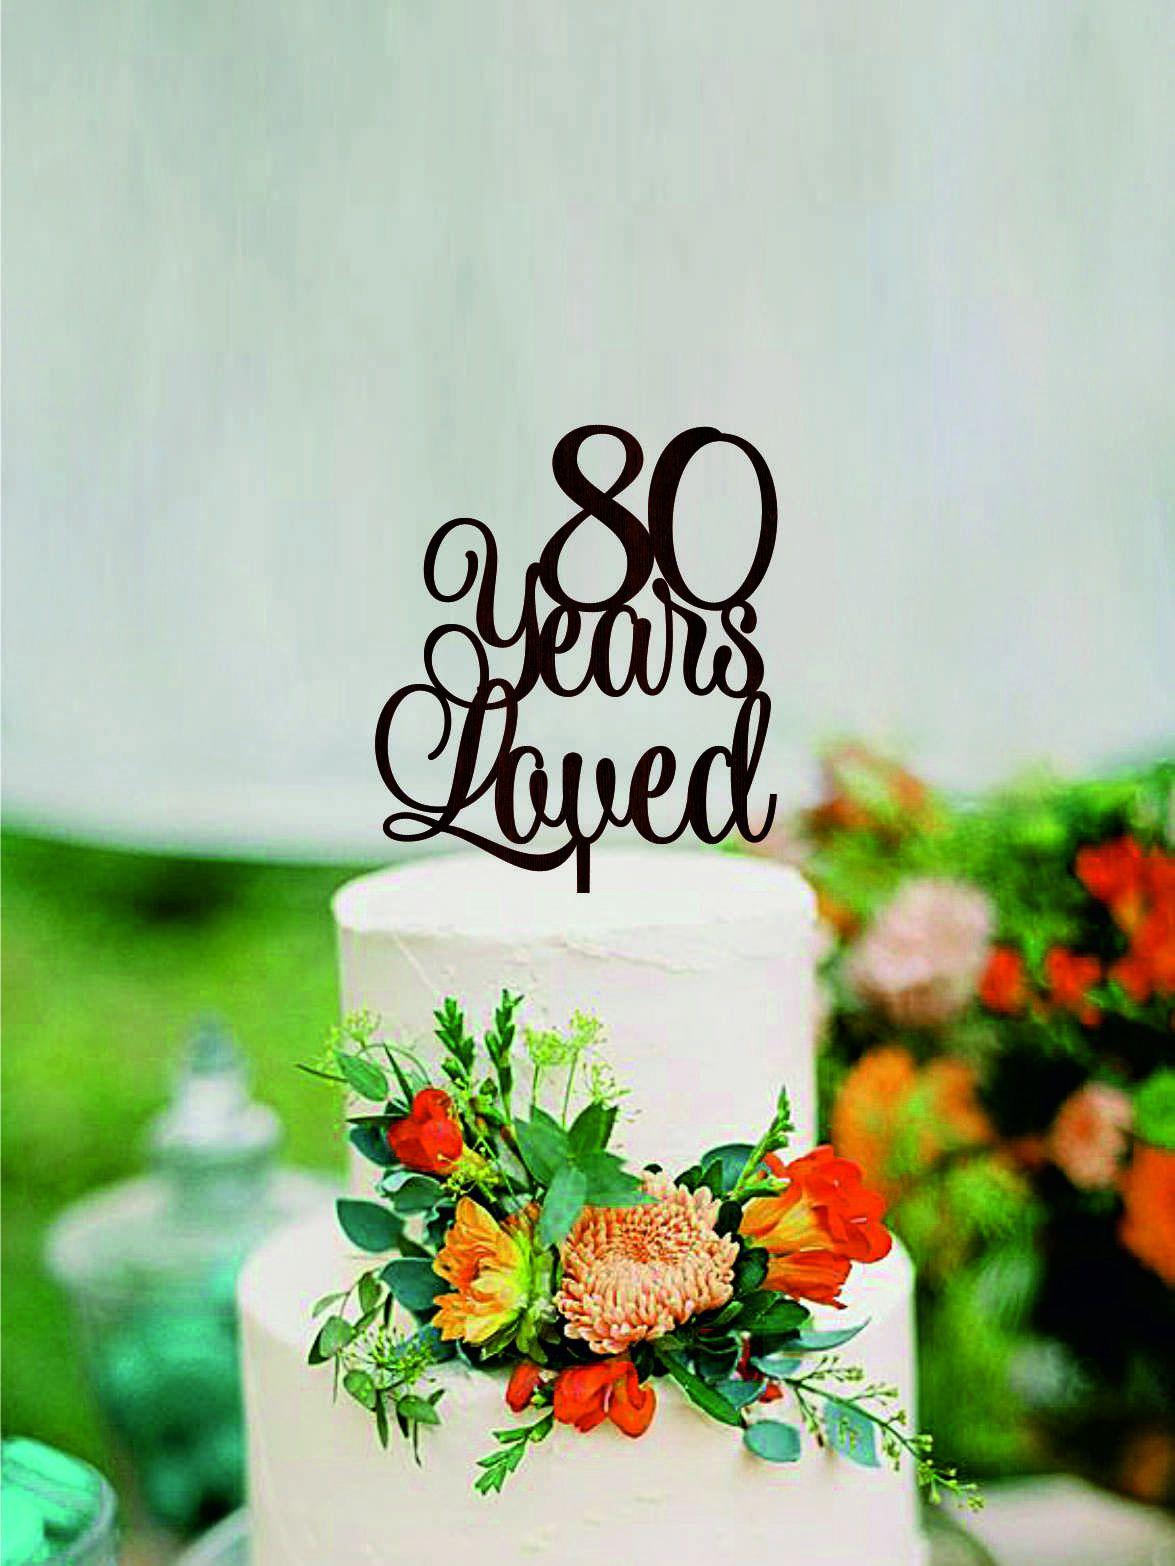 80 Years Loved Happy 80th Birthday Cake Topper Anniversary Cake